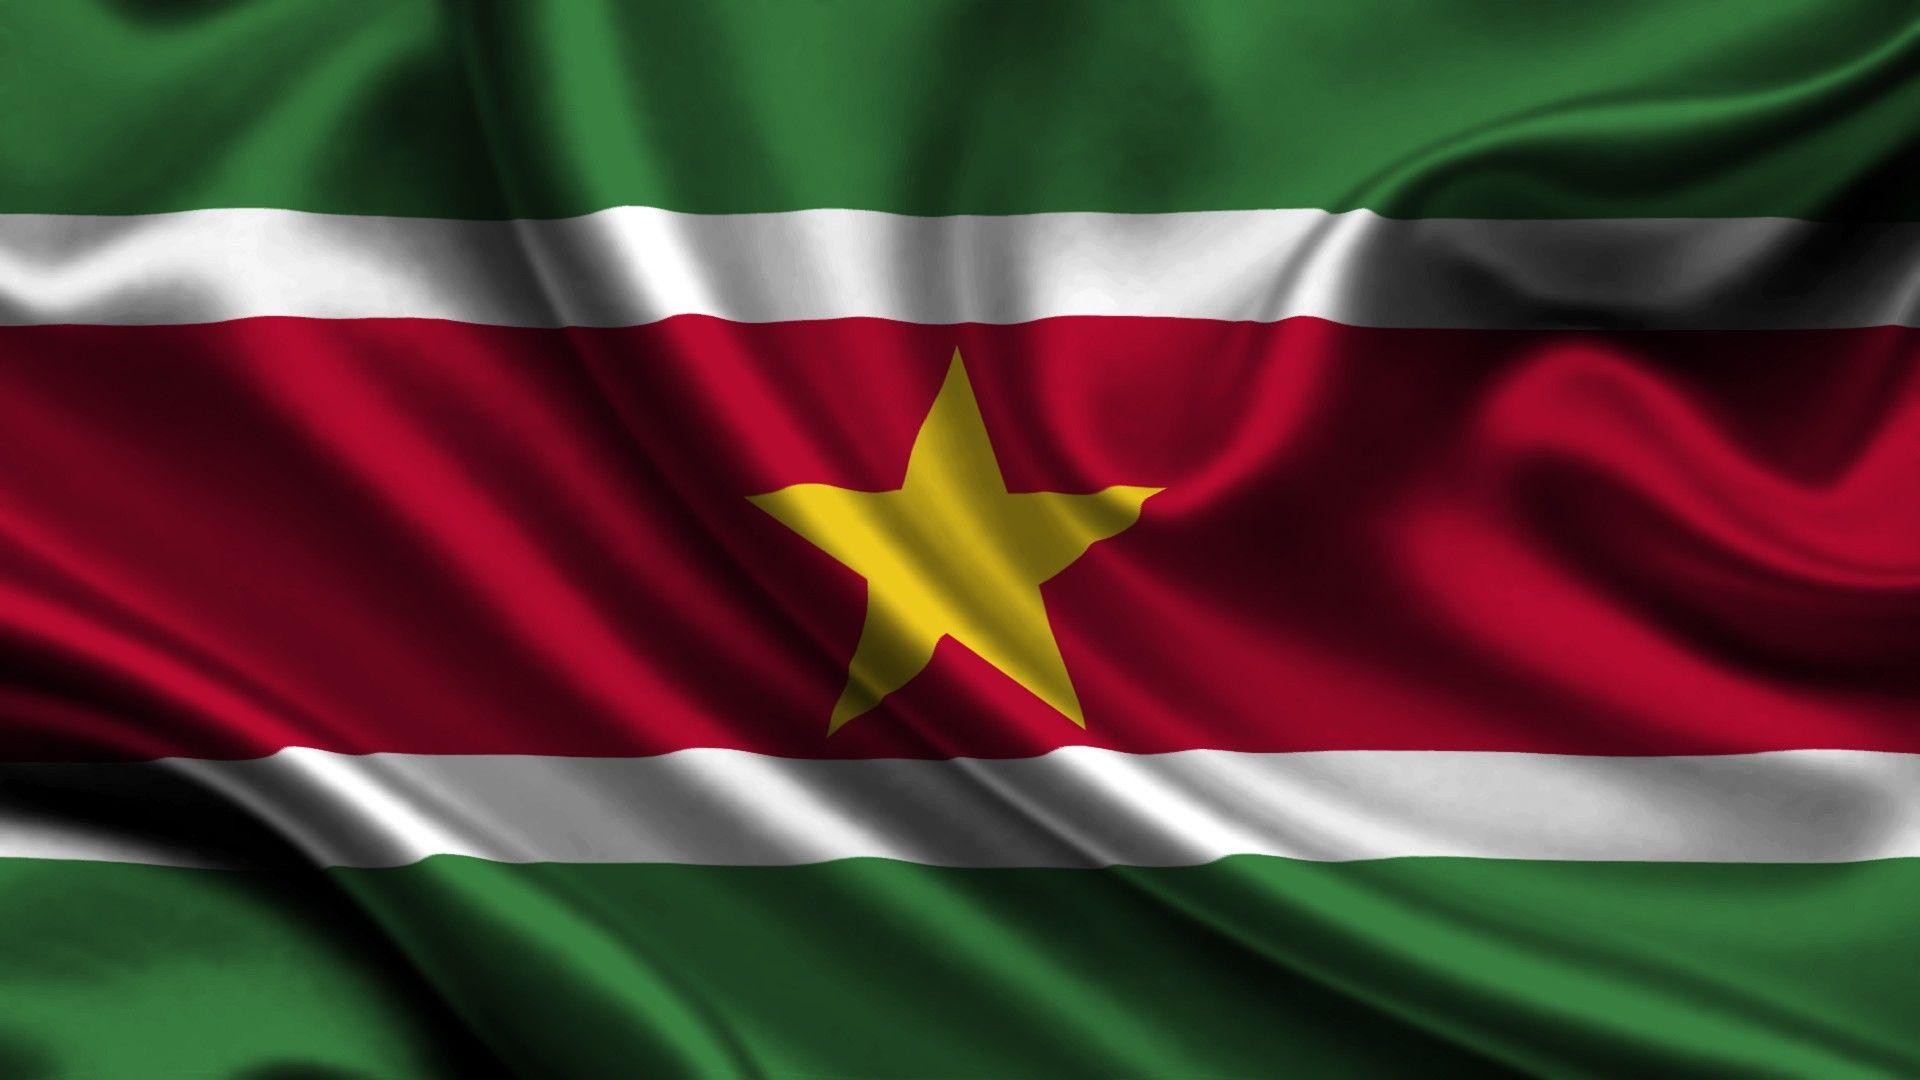 Flag of Suriname wallpaper Flags wallpaper Suriname flag Flag 1920x1080